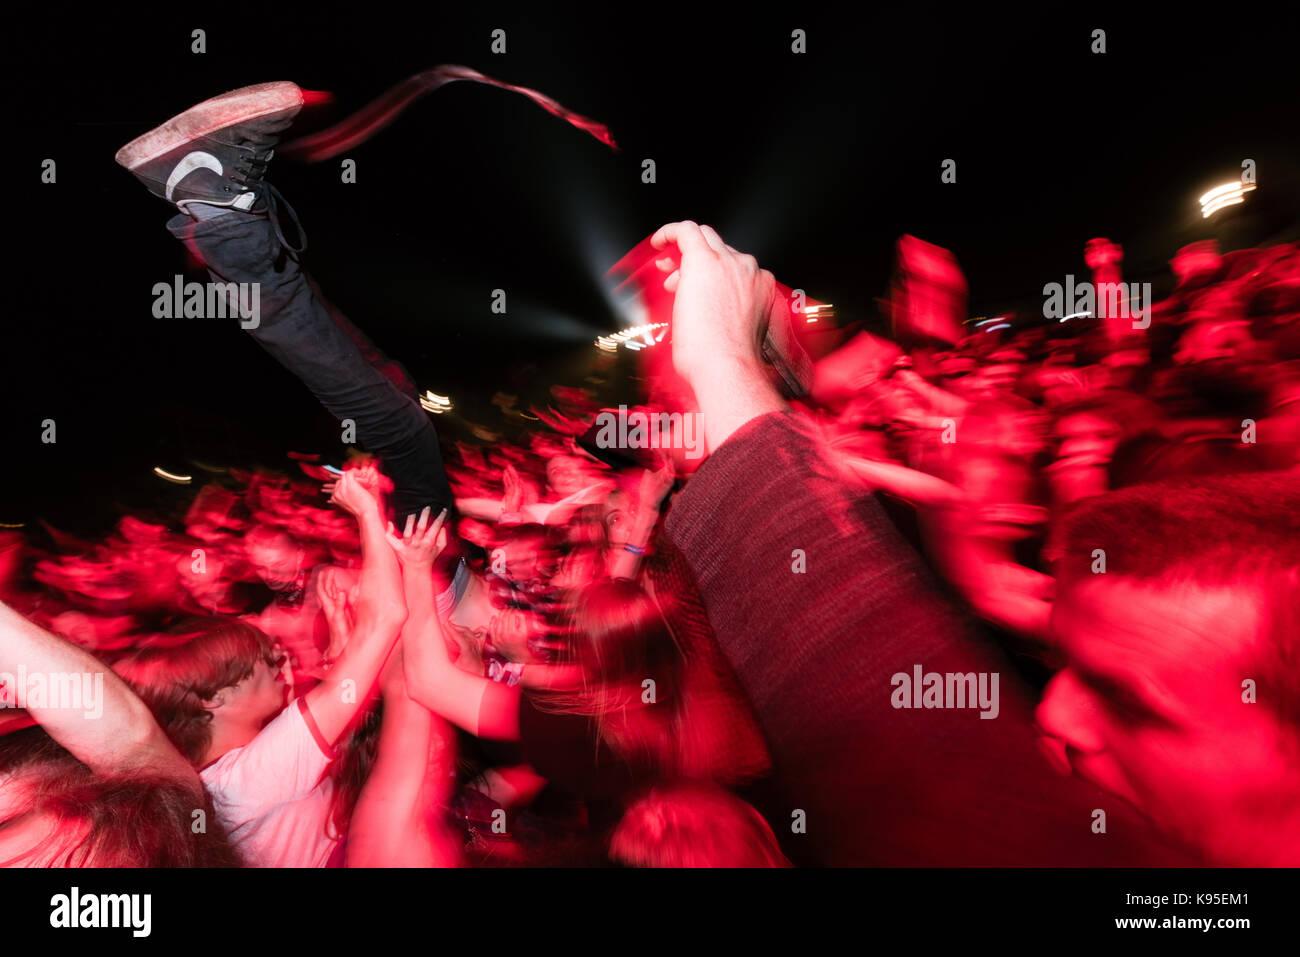 01.08.2015 kostrzyn nad odra 21 przystanek woodstock / uczestnik festiwalu dryfujacy na tlumie pod scena glowna Imagen De Stock